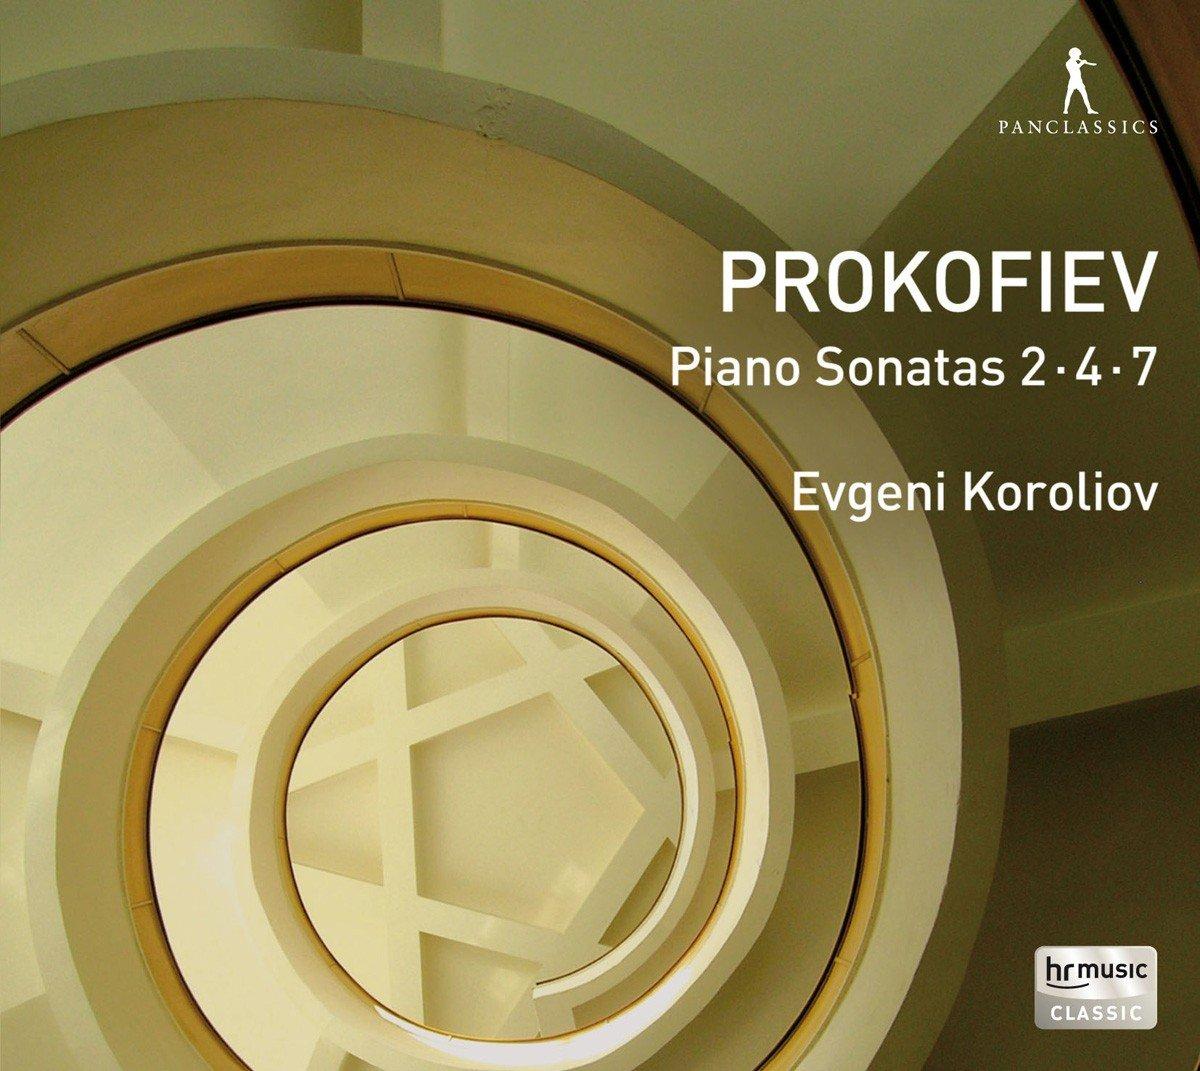 Prokofiev Sonates pour piano - Page 2 71hvaVOiYBL._SL1200_